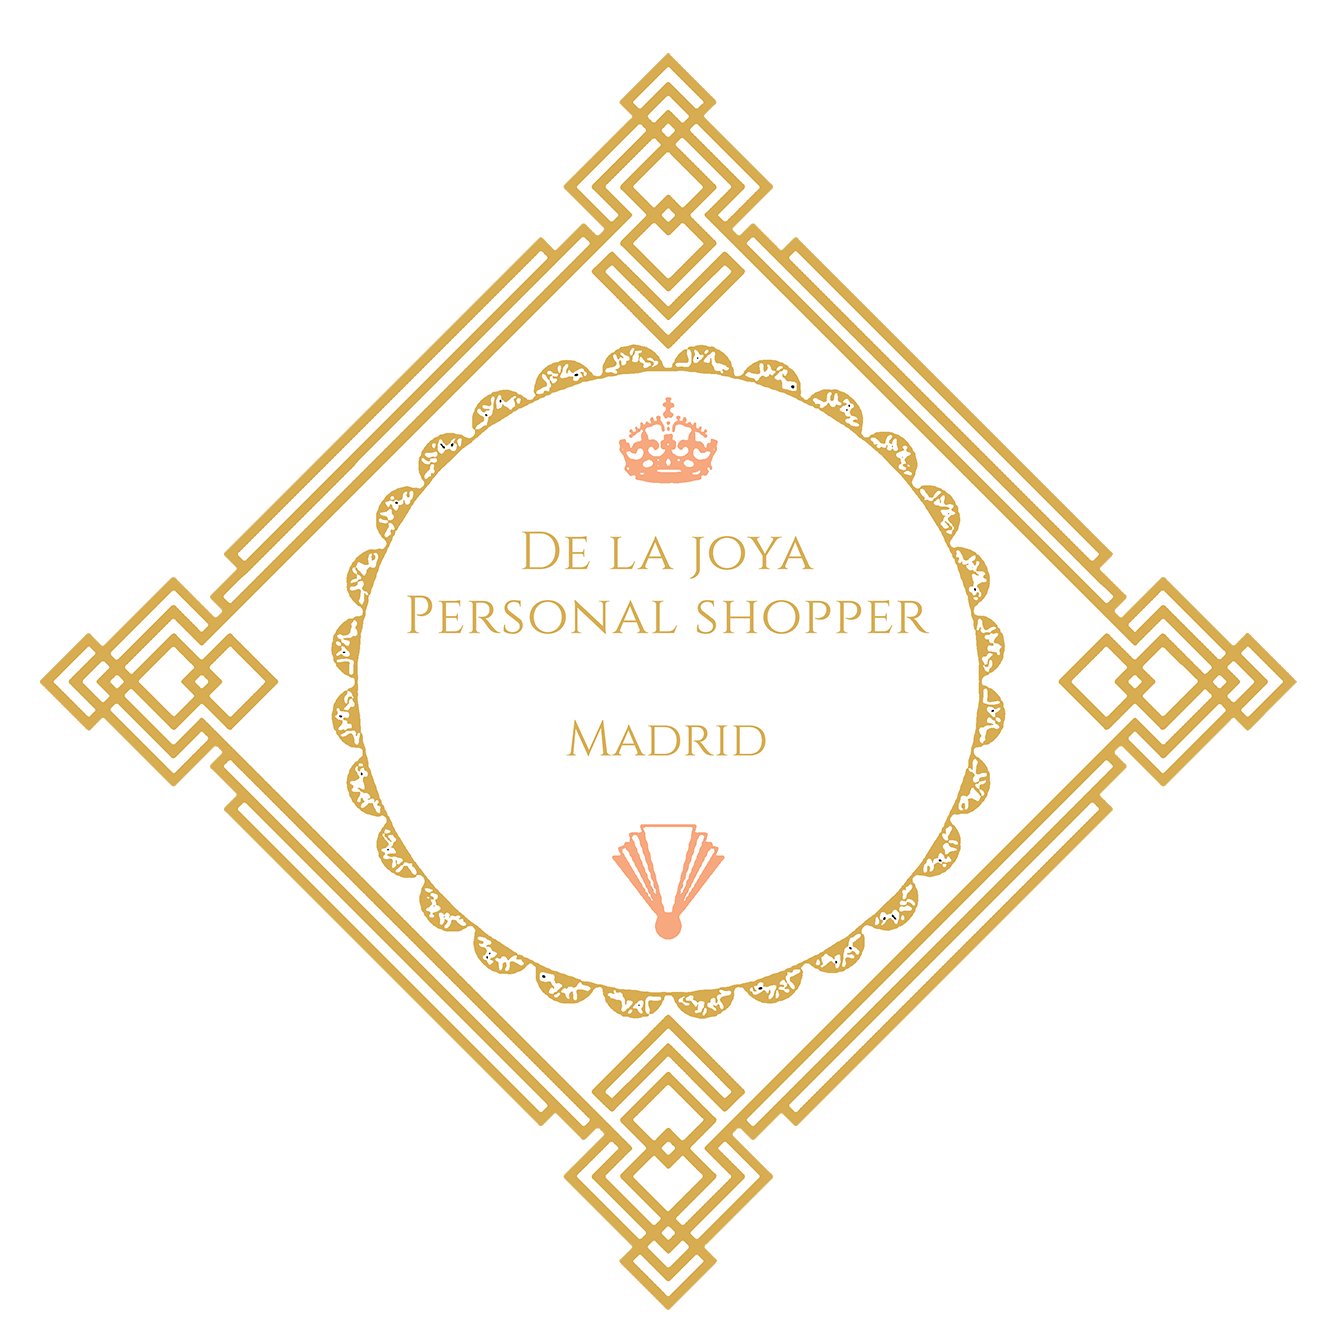 logo-delajoya-personal-shopper